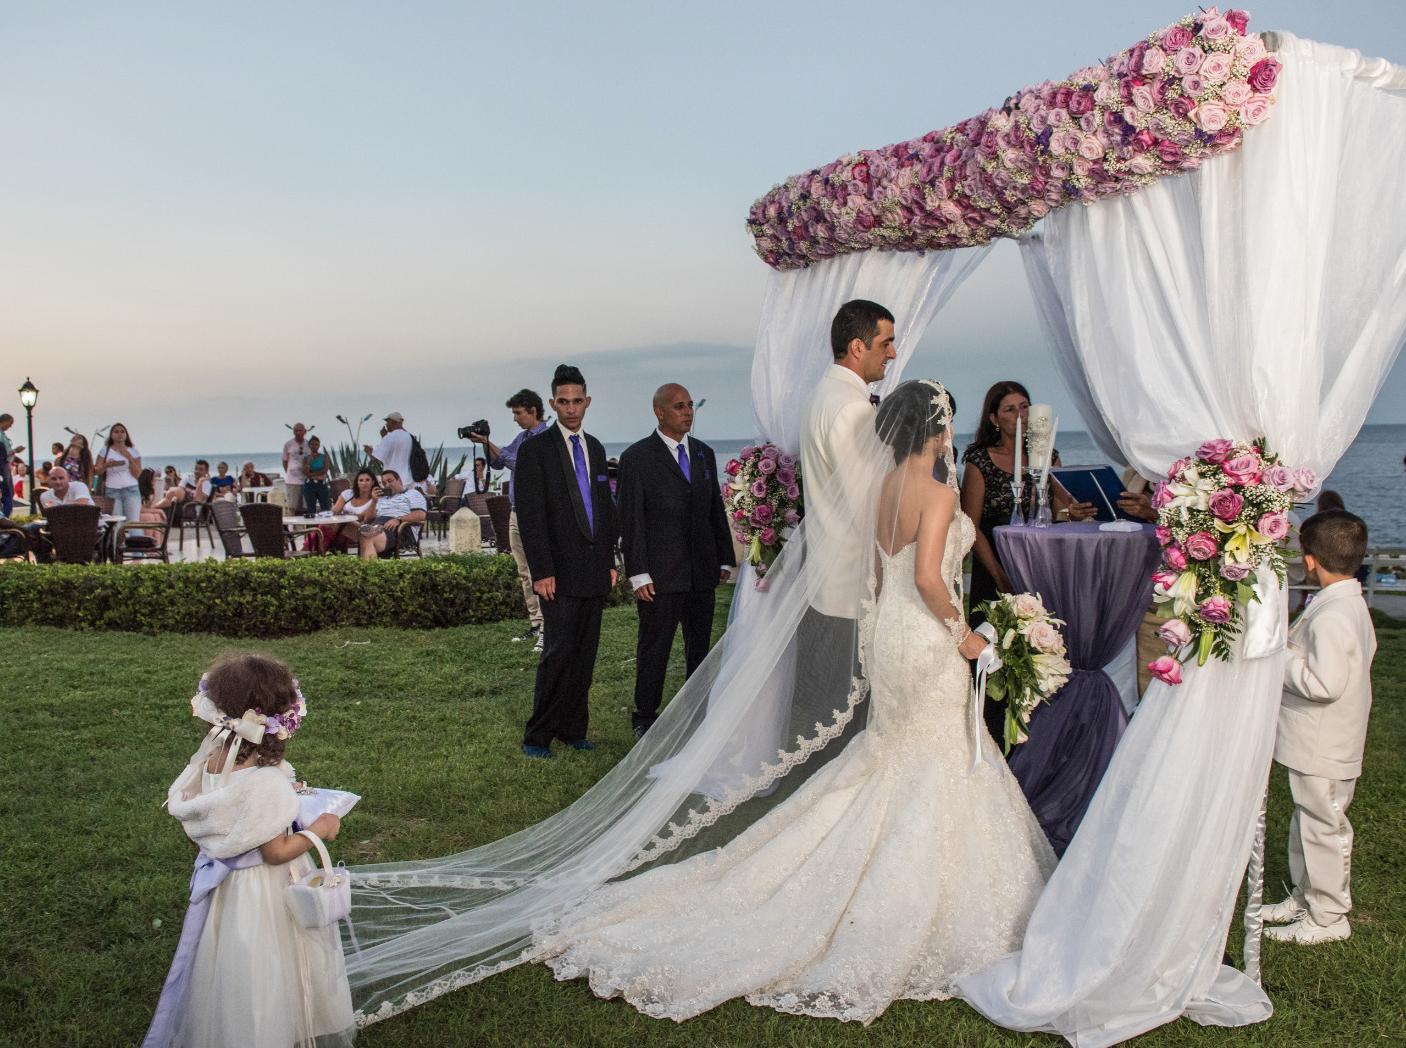 bodas-estilo-clasico-sin-tema-cuba-16562.jpg